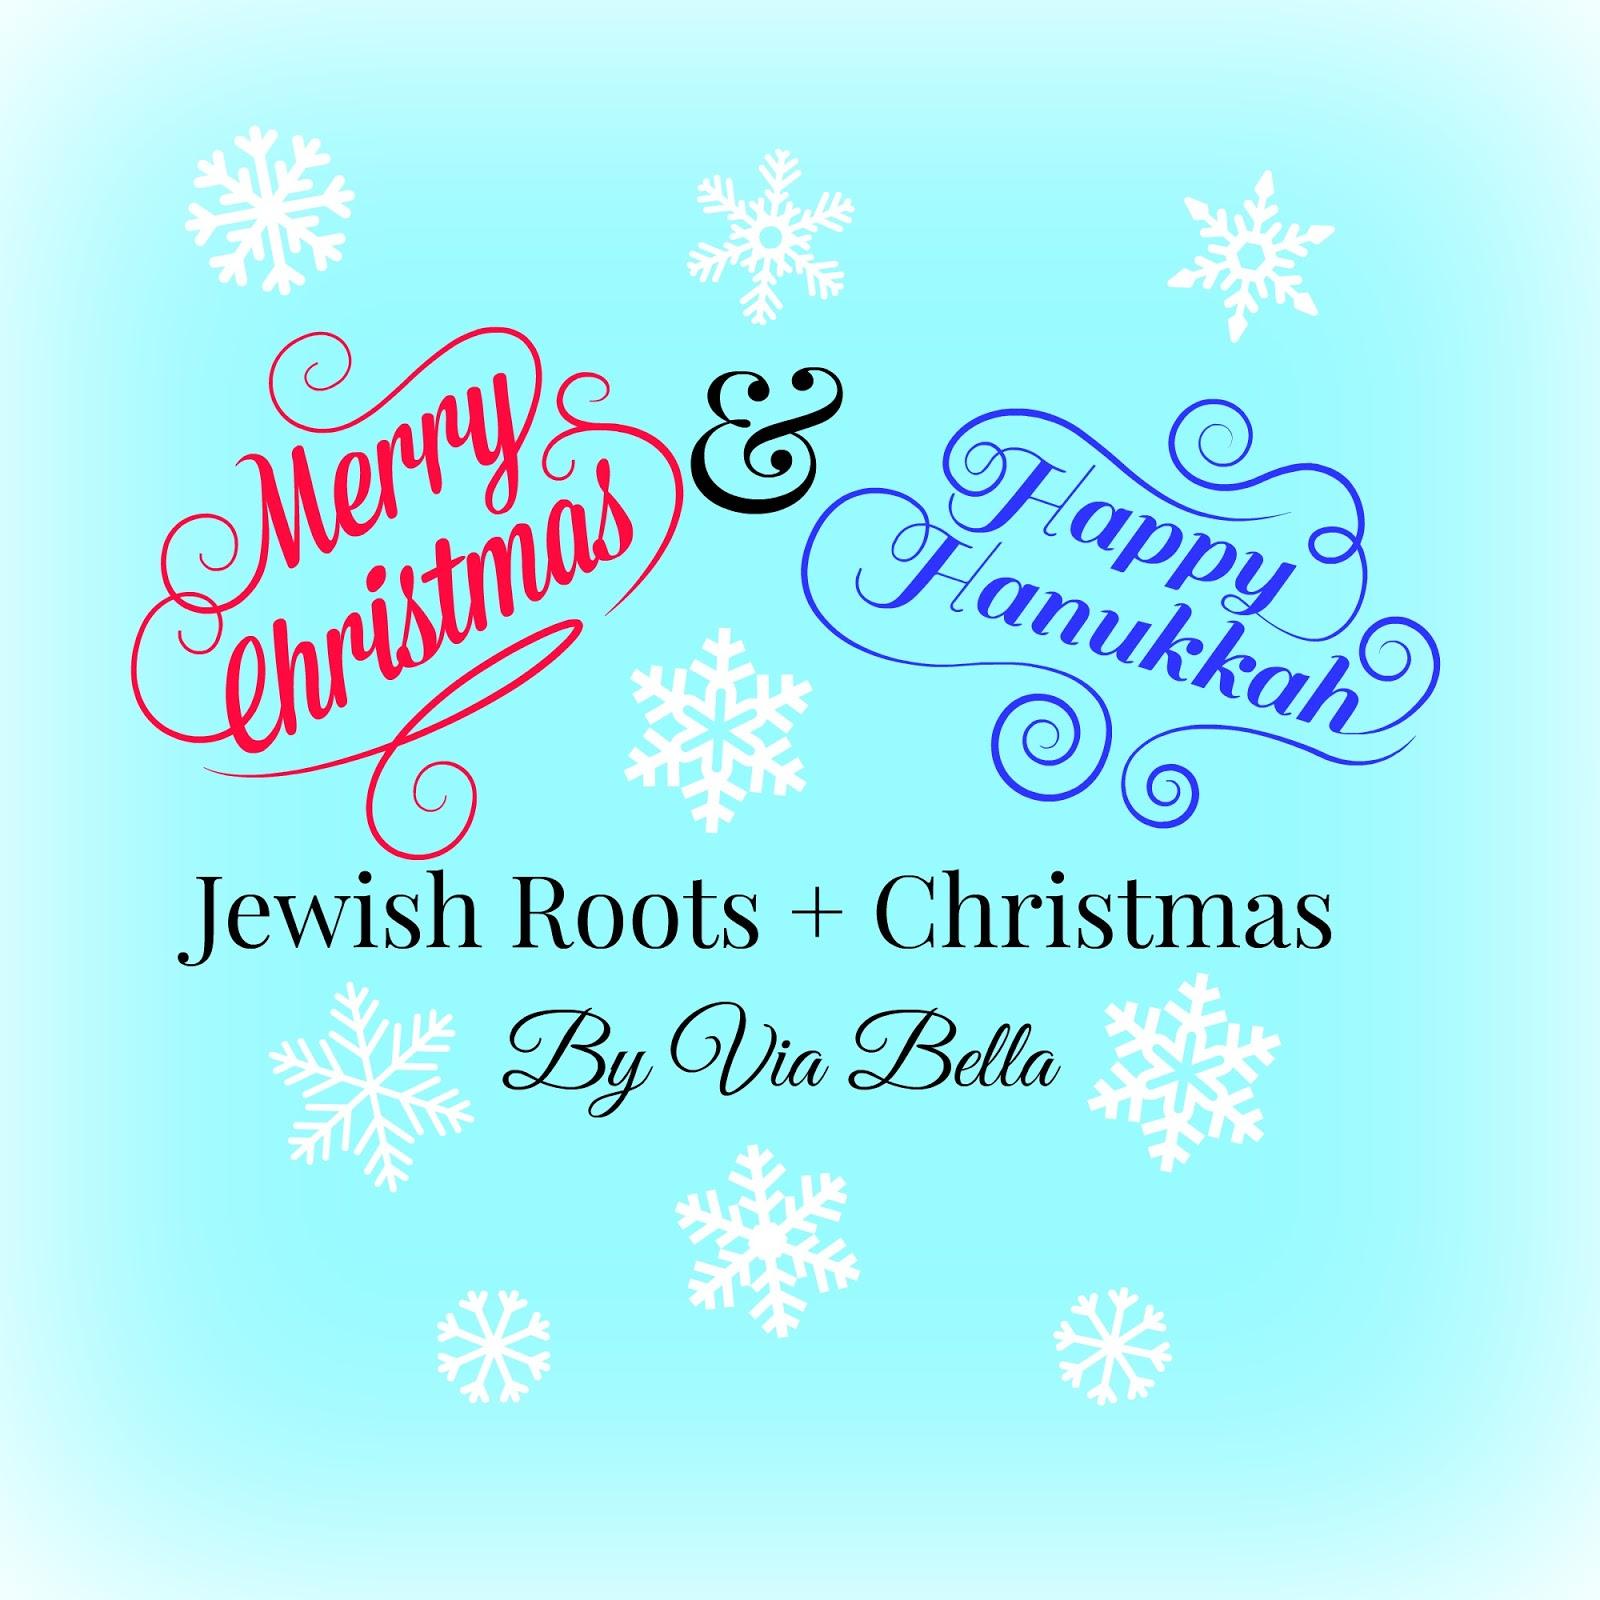 Via Bella: Jewish Roots + Christmas